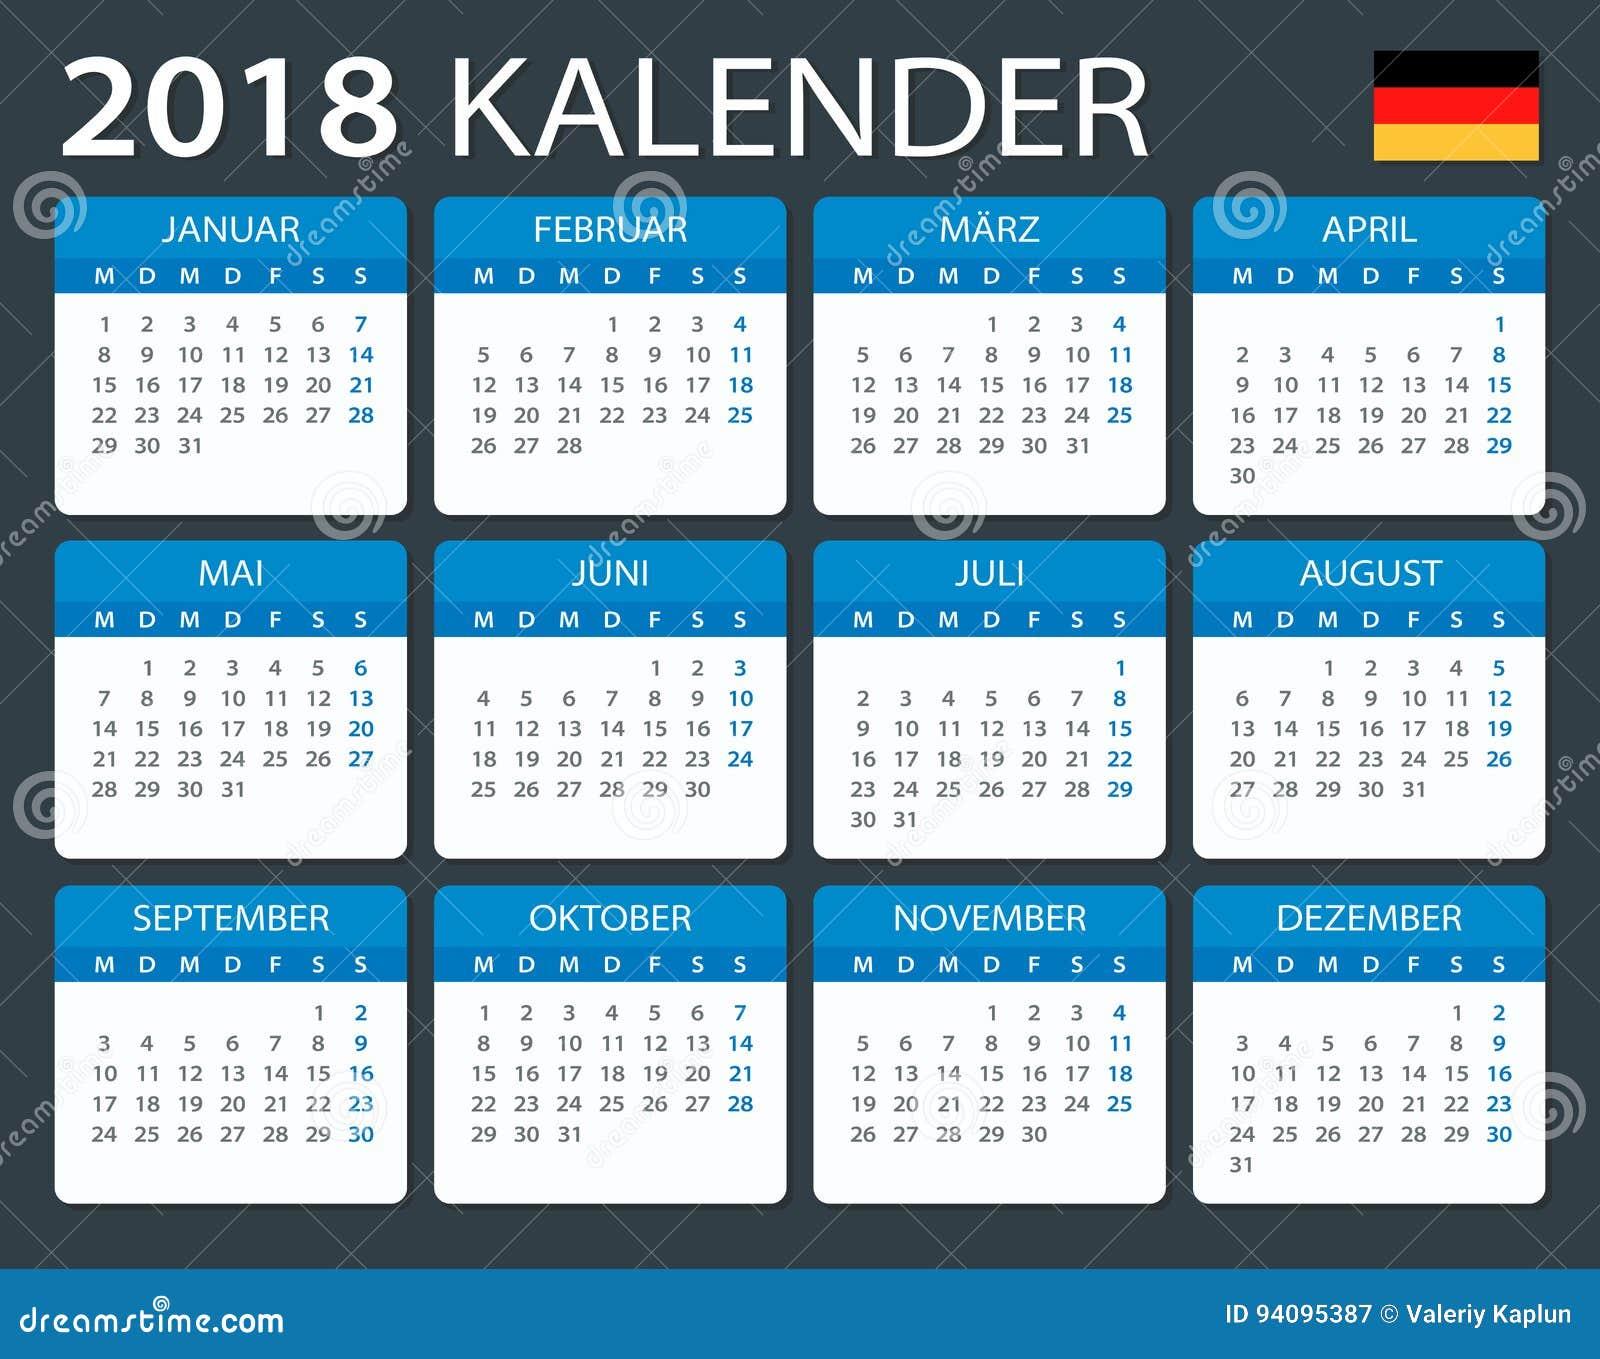 calendar 2018 german version